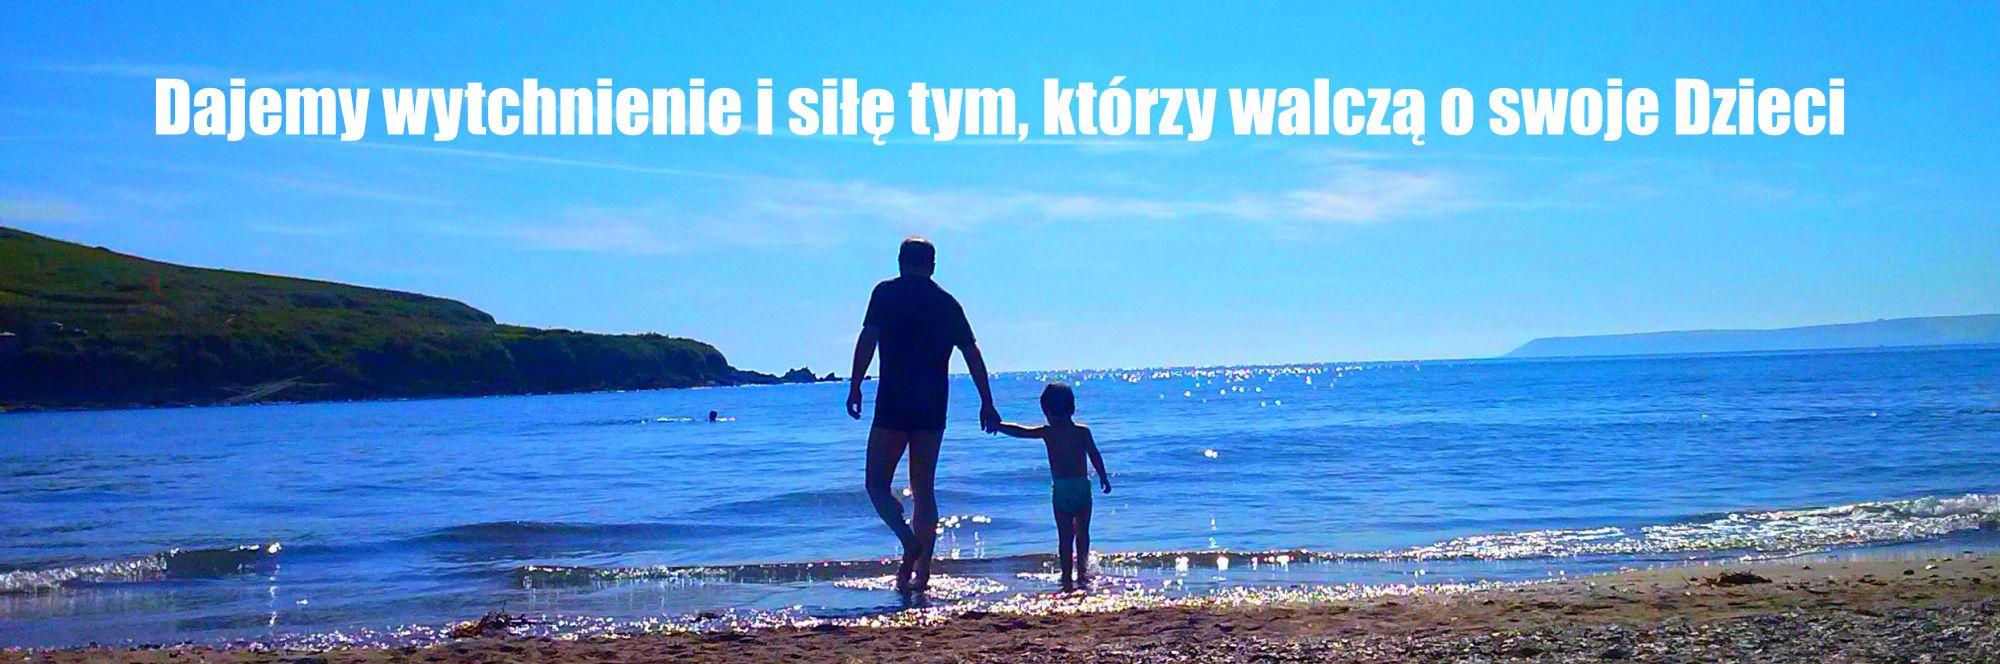 TylkoTata.pl